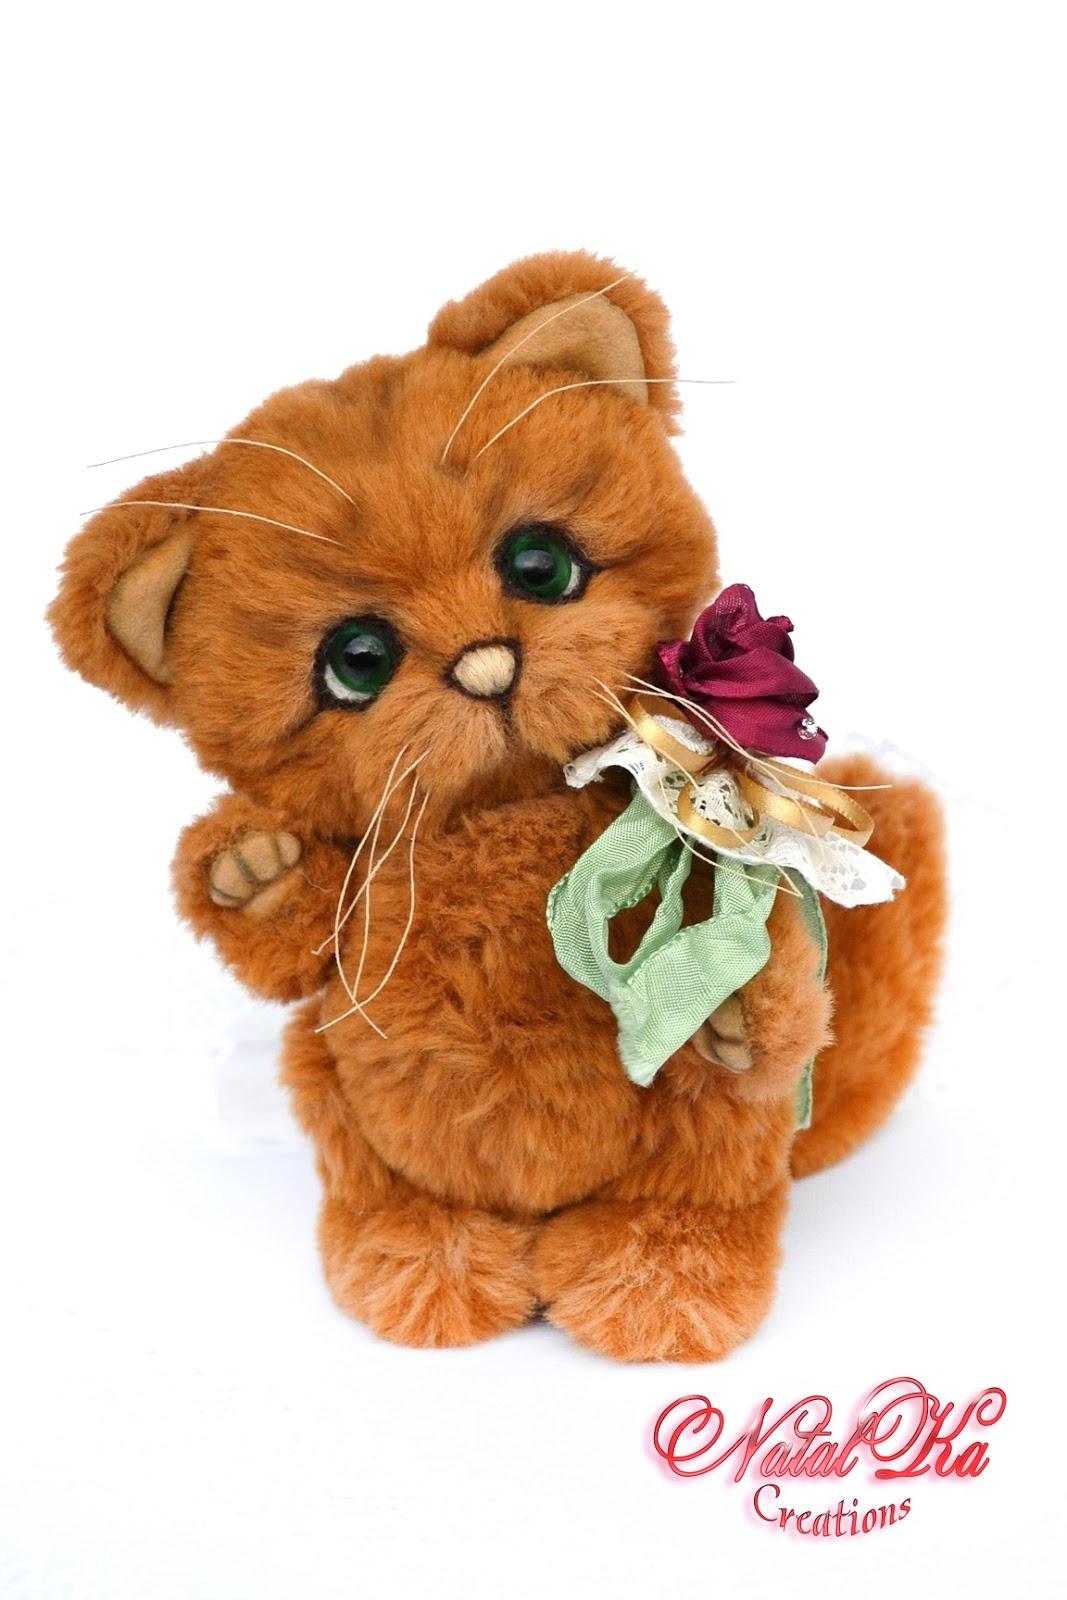 Artist teddy bear, artist bear, artist teddy cat, cat, teddy bear, ooak, artist bear jointed, handmade by NatalKa Creations. Künstlerbär, Künstlerteddy, Teddybär, Teddy, Teddy Katze, Kater, Unikat, handgemacht von NatalKa Creations